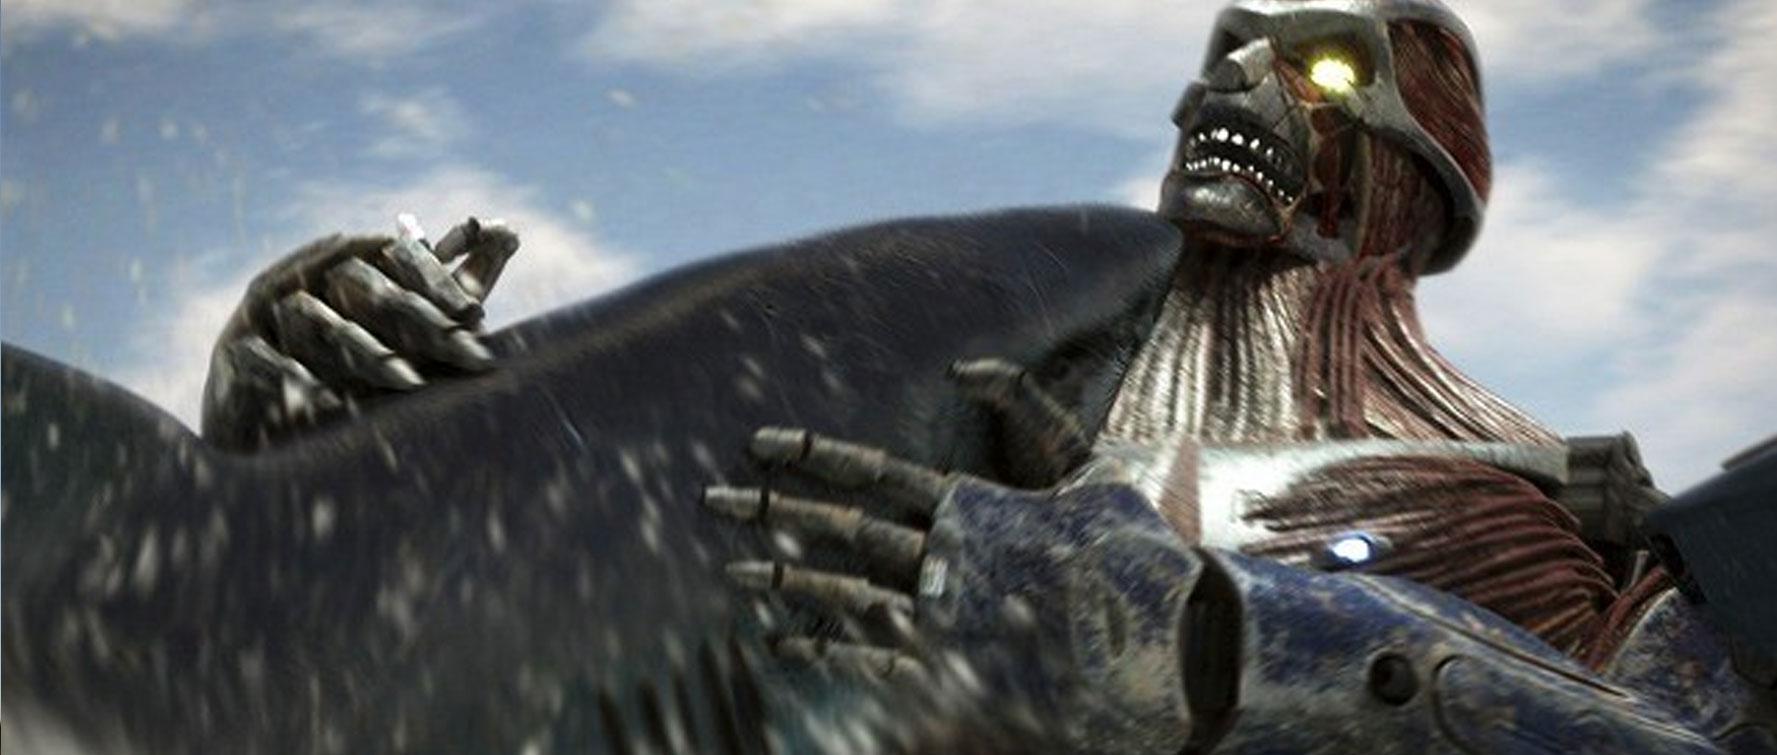 Mega Tiburón contra Kolossus